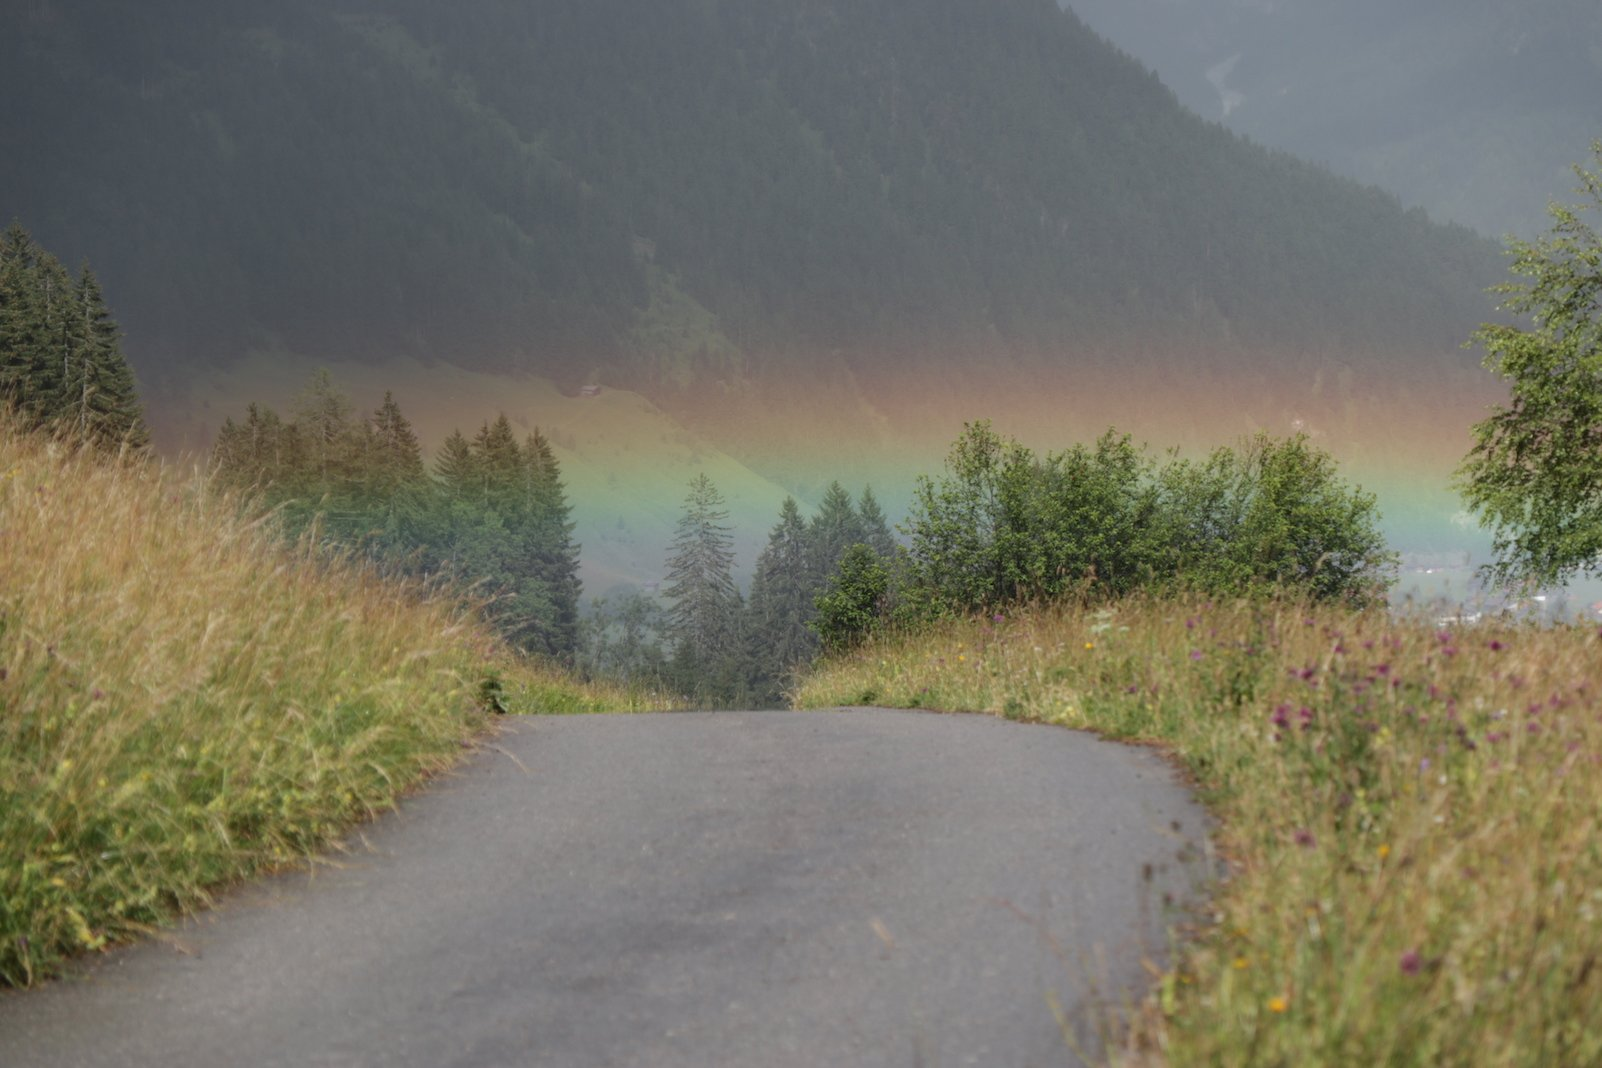 Wahnsinn - unter uns beginnt ein Regenbogen!